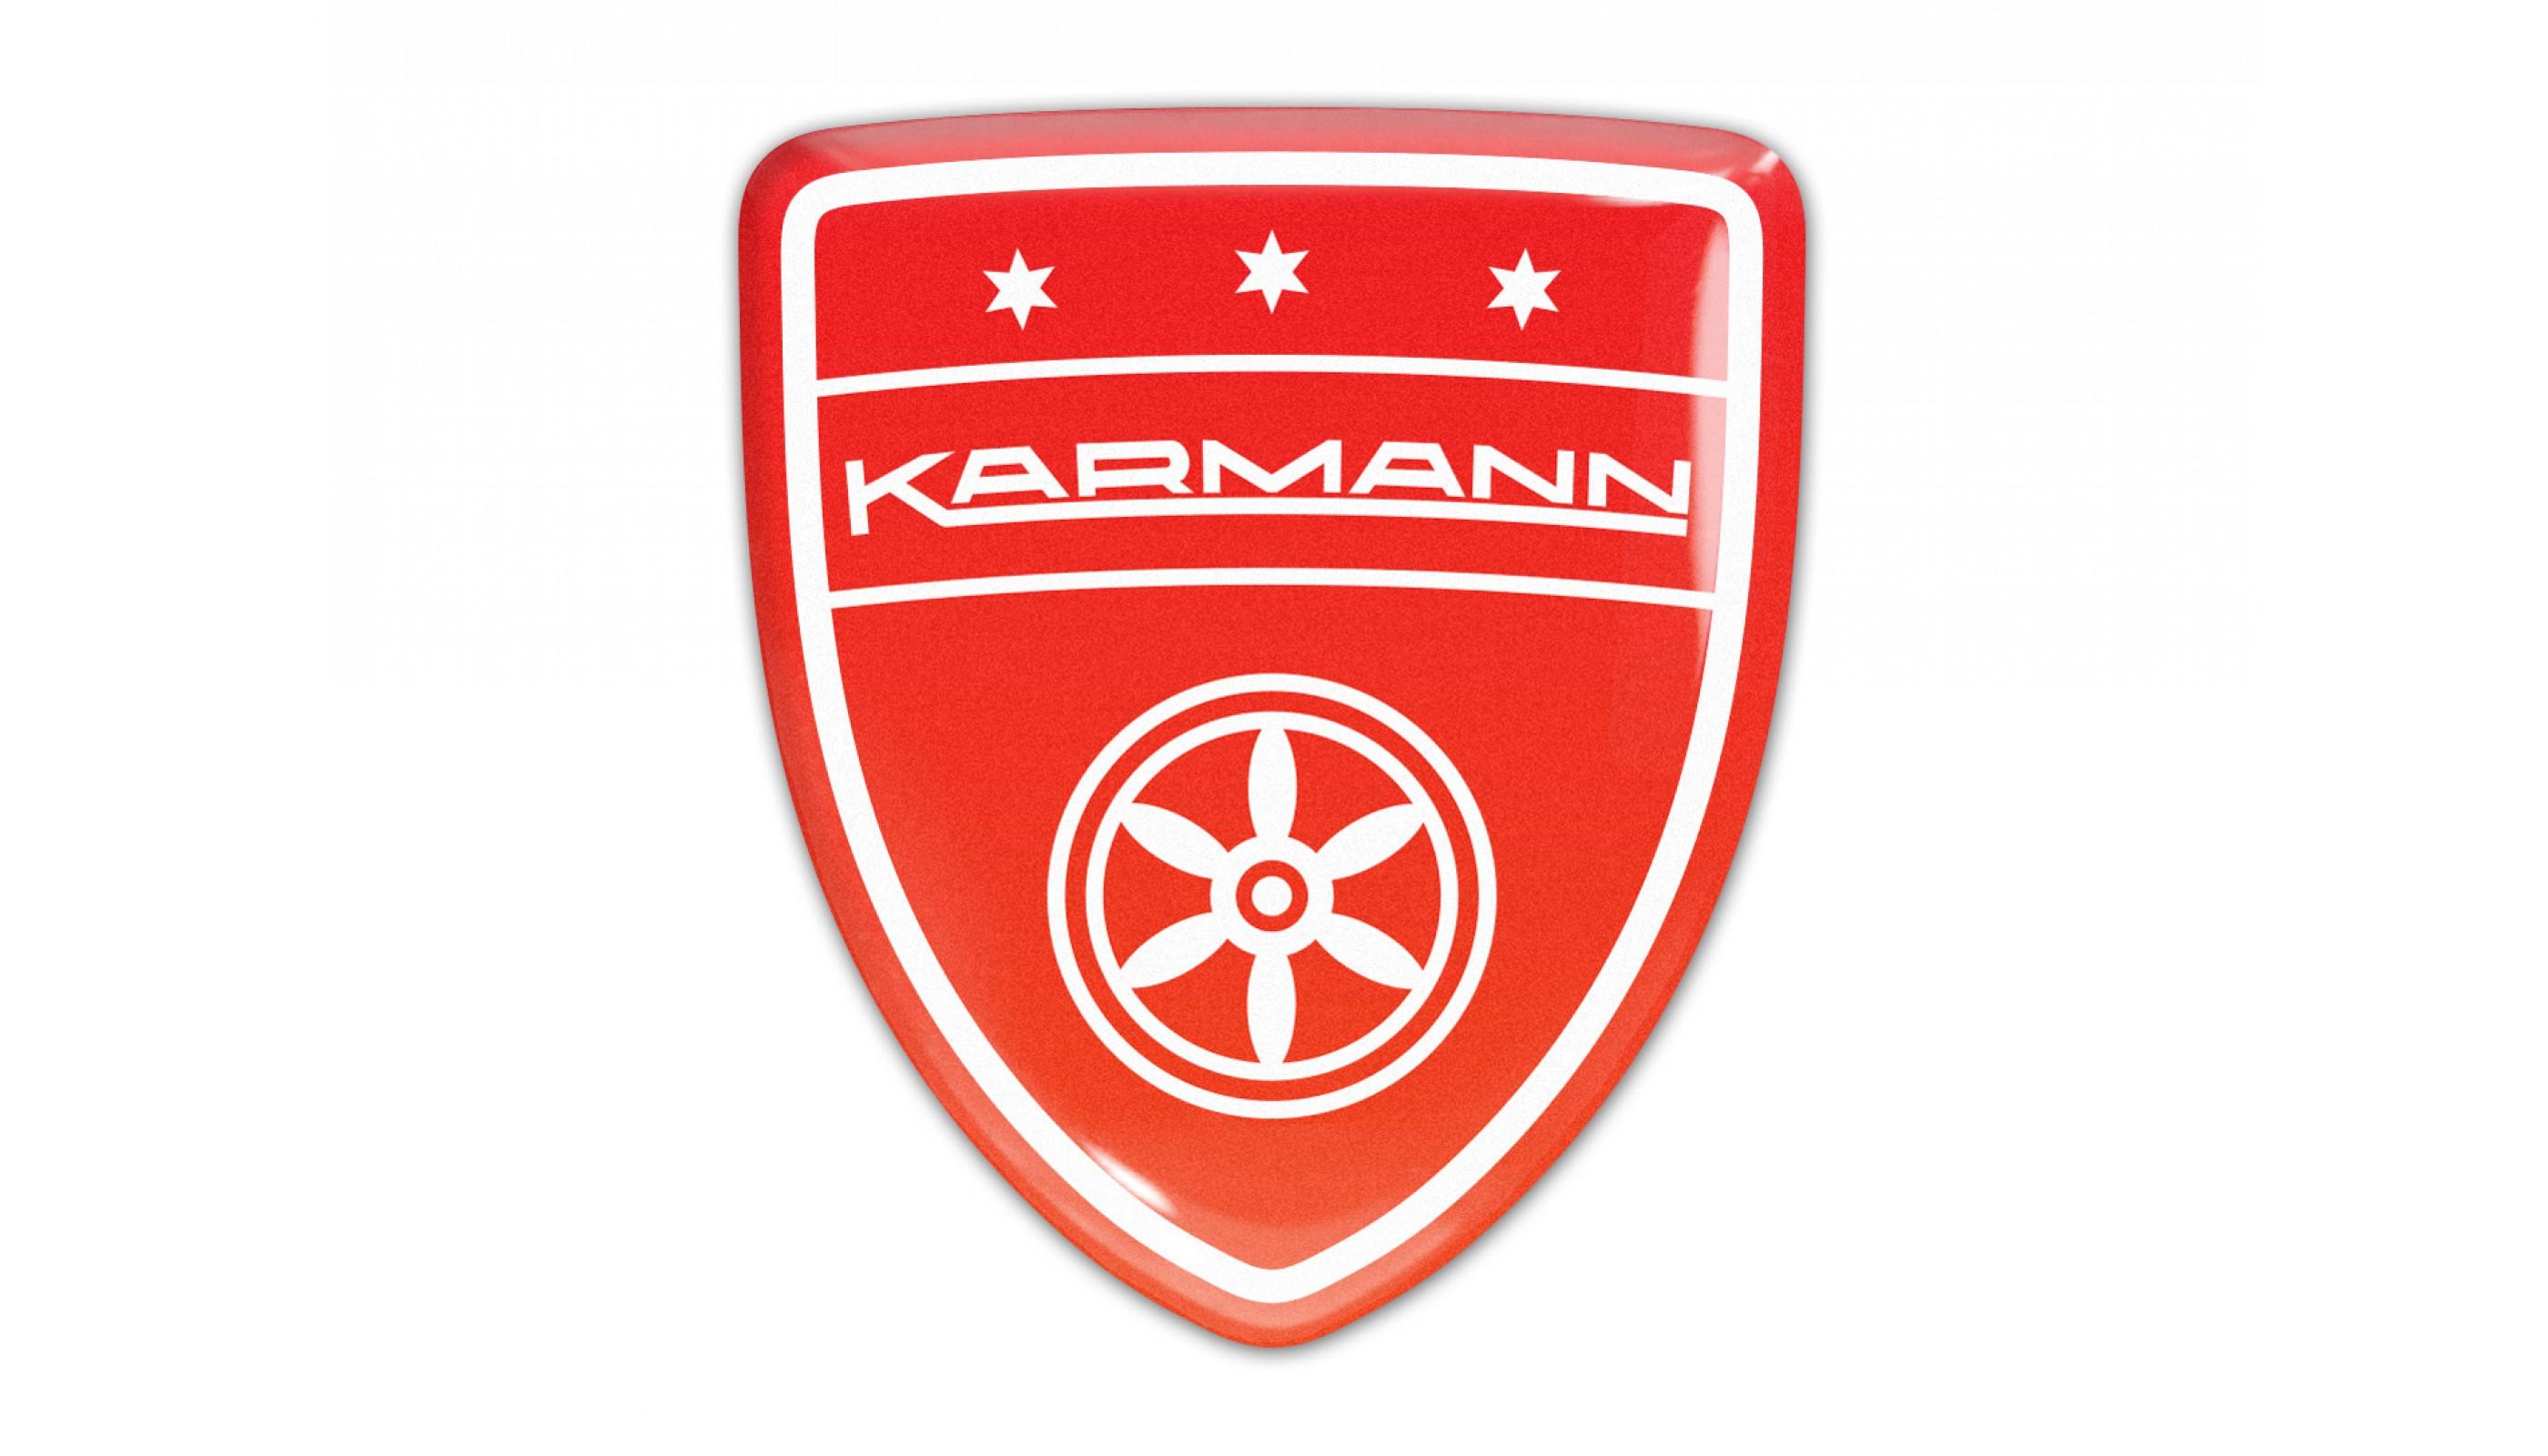 Karmann Red